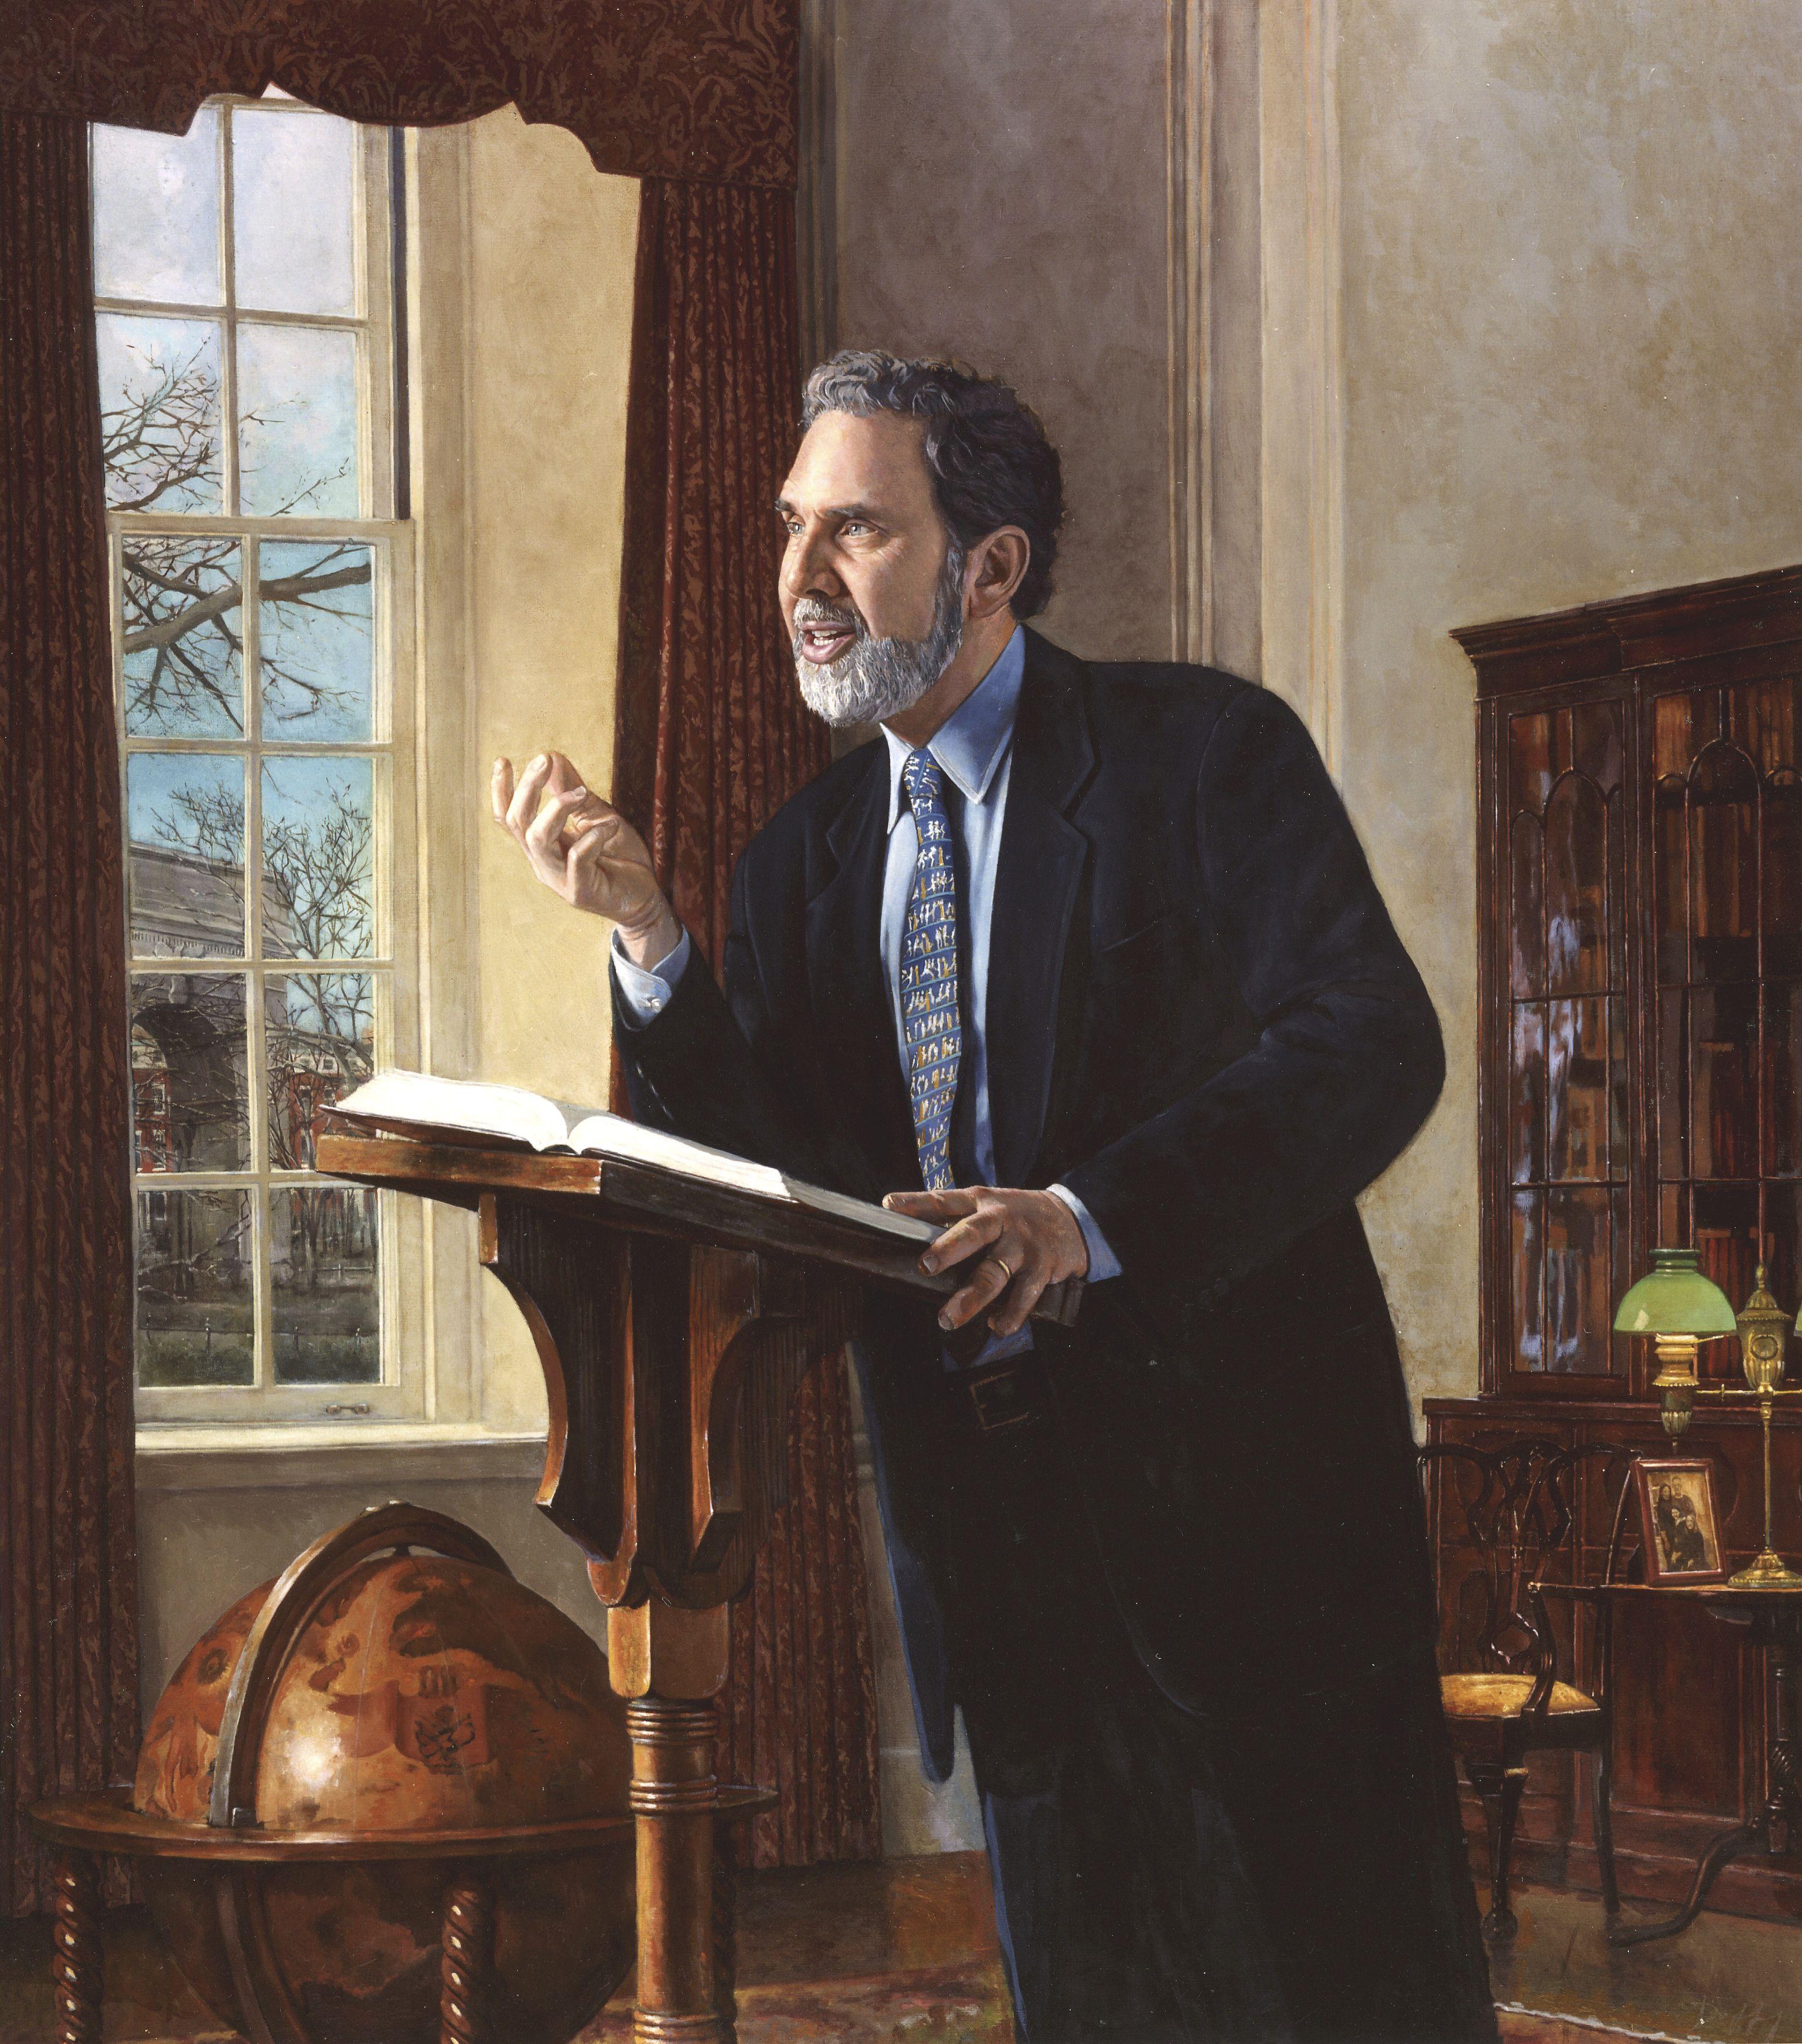 New York University, President, John E Sexton NYU Law School